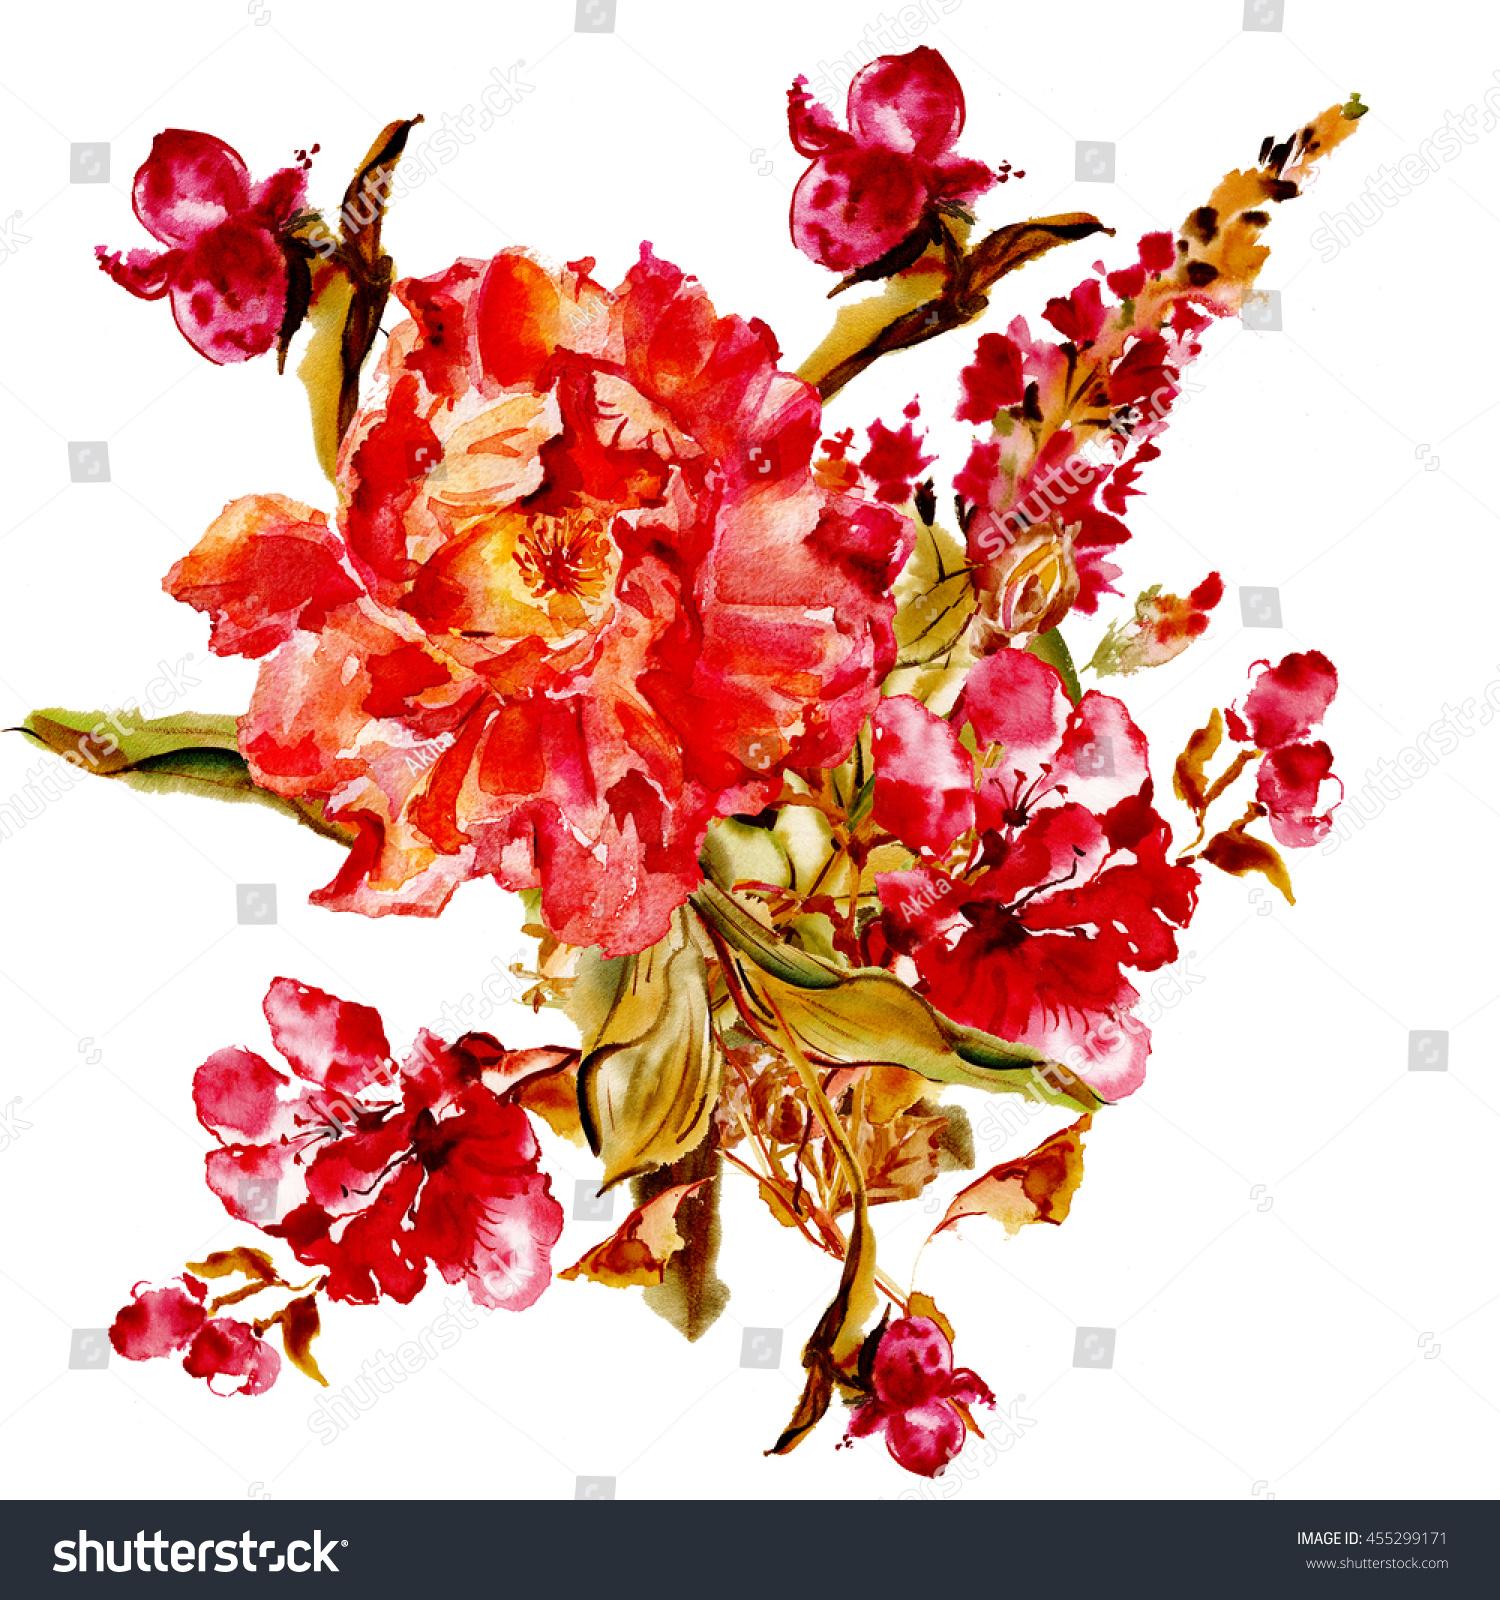 Flower Watercolor Background Floral Illustration Pink Stock ...